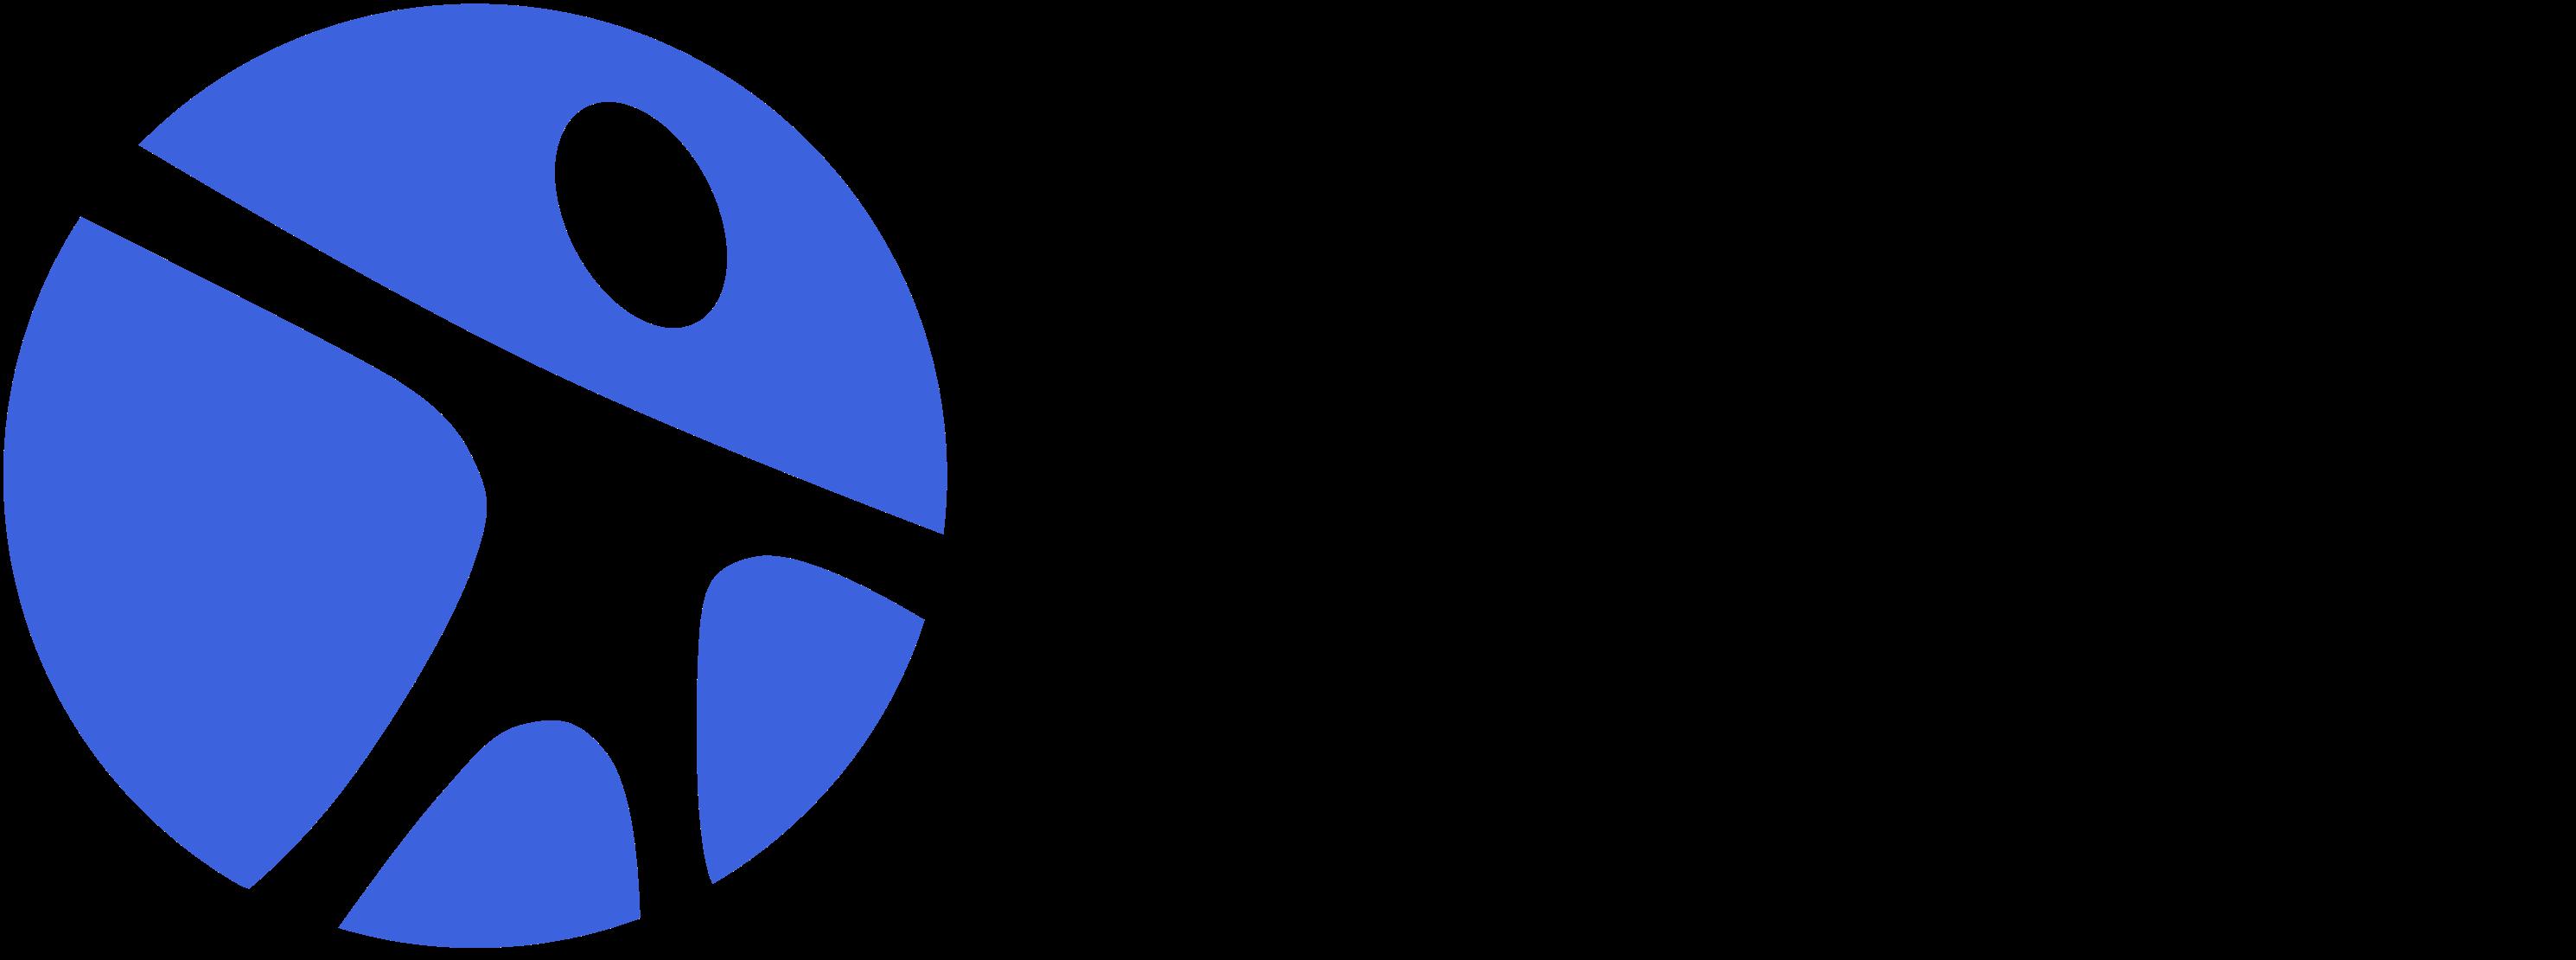 BJS Personal GmbH Logo